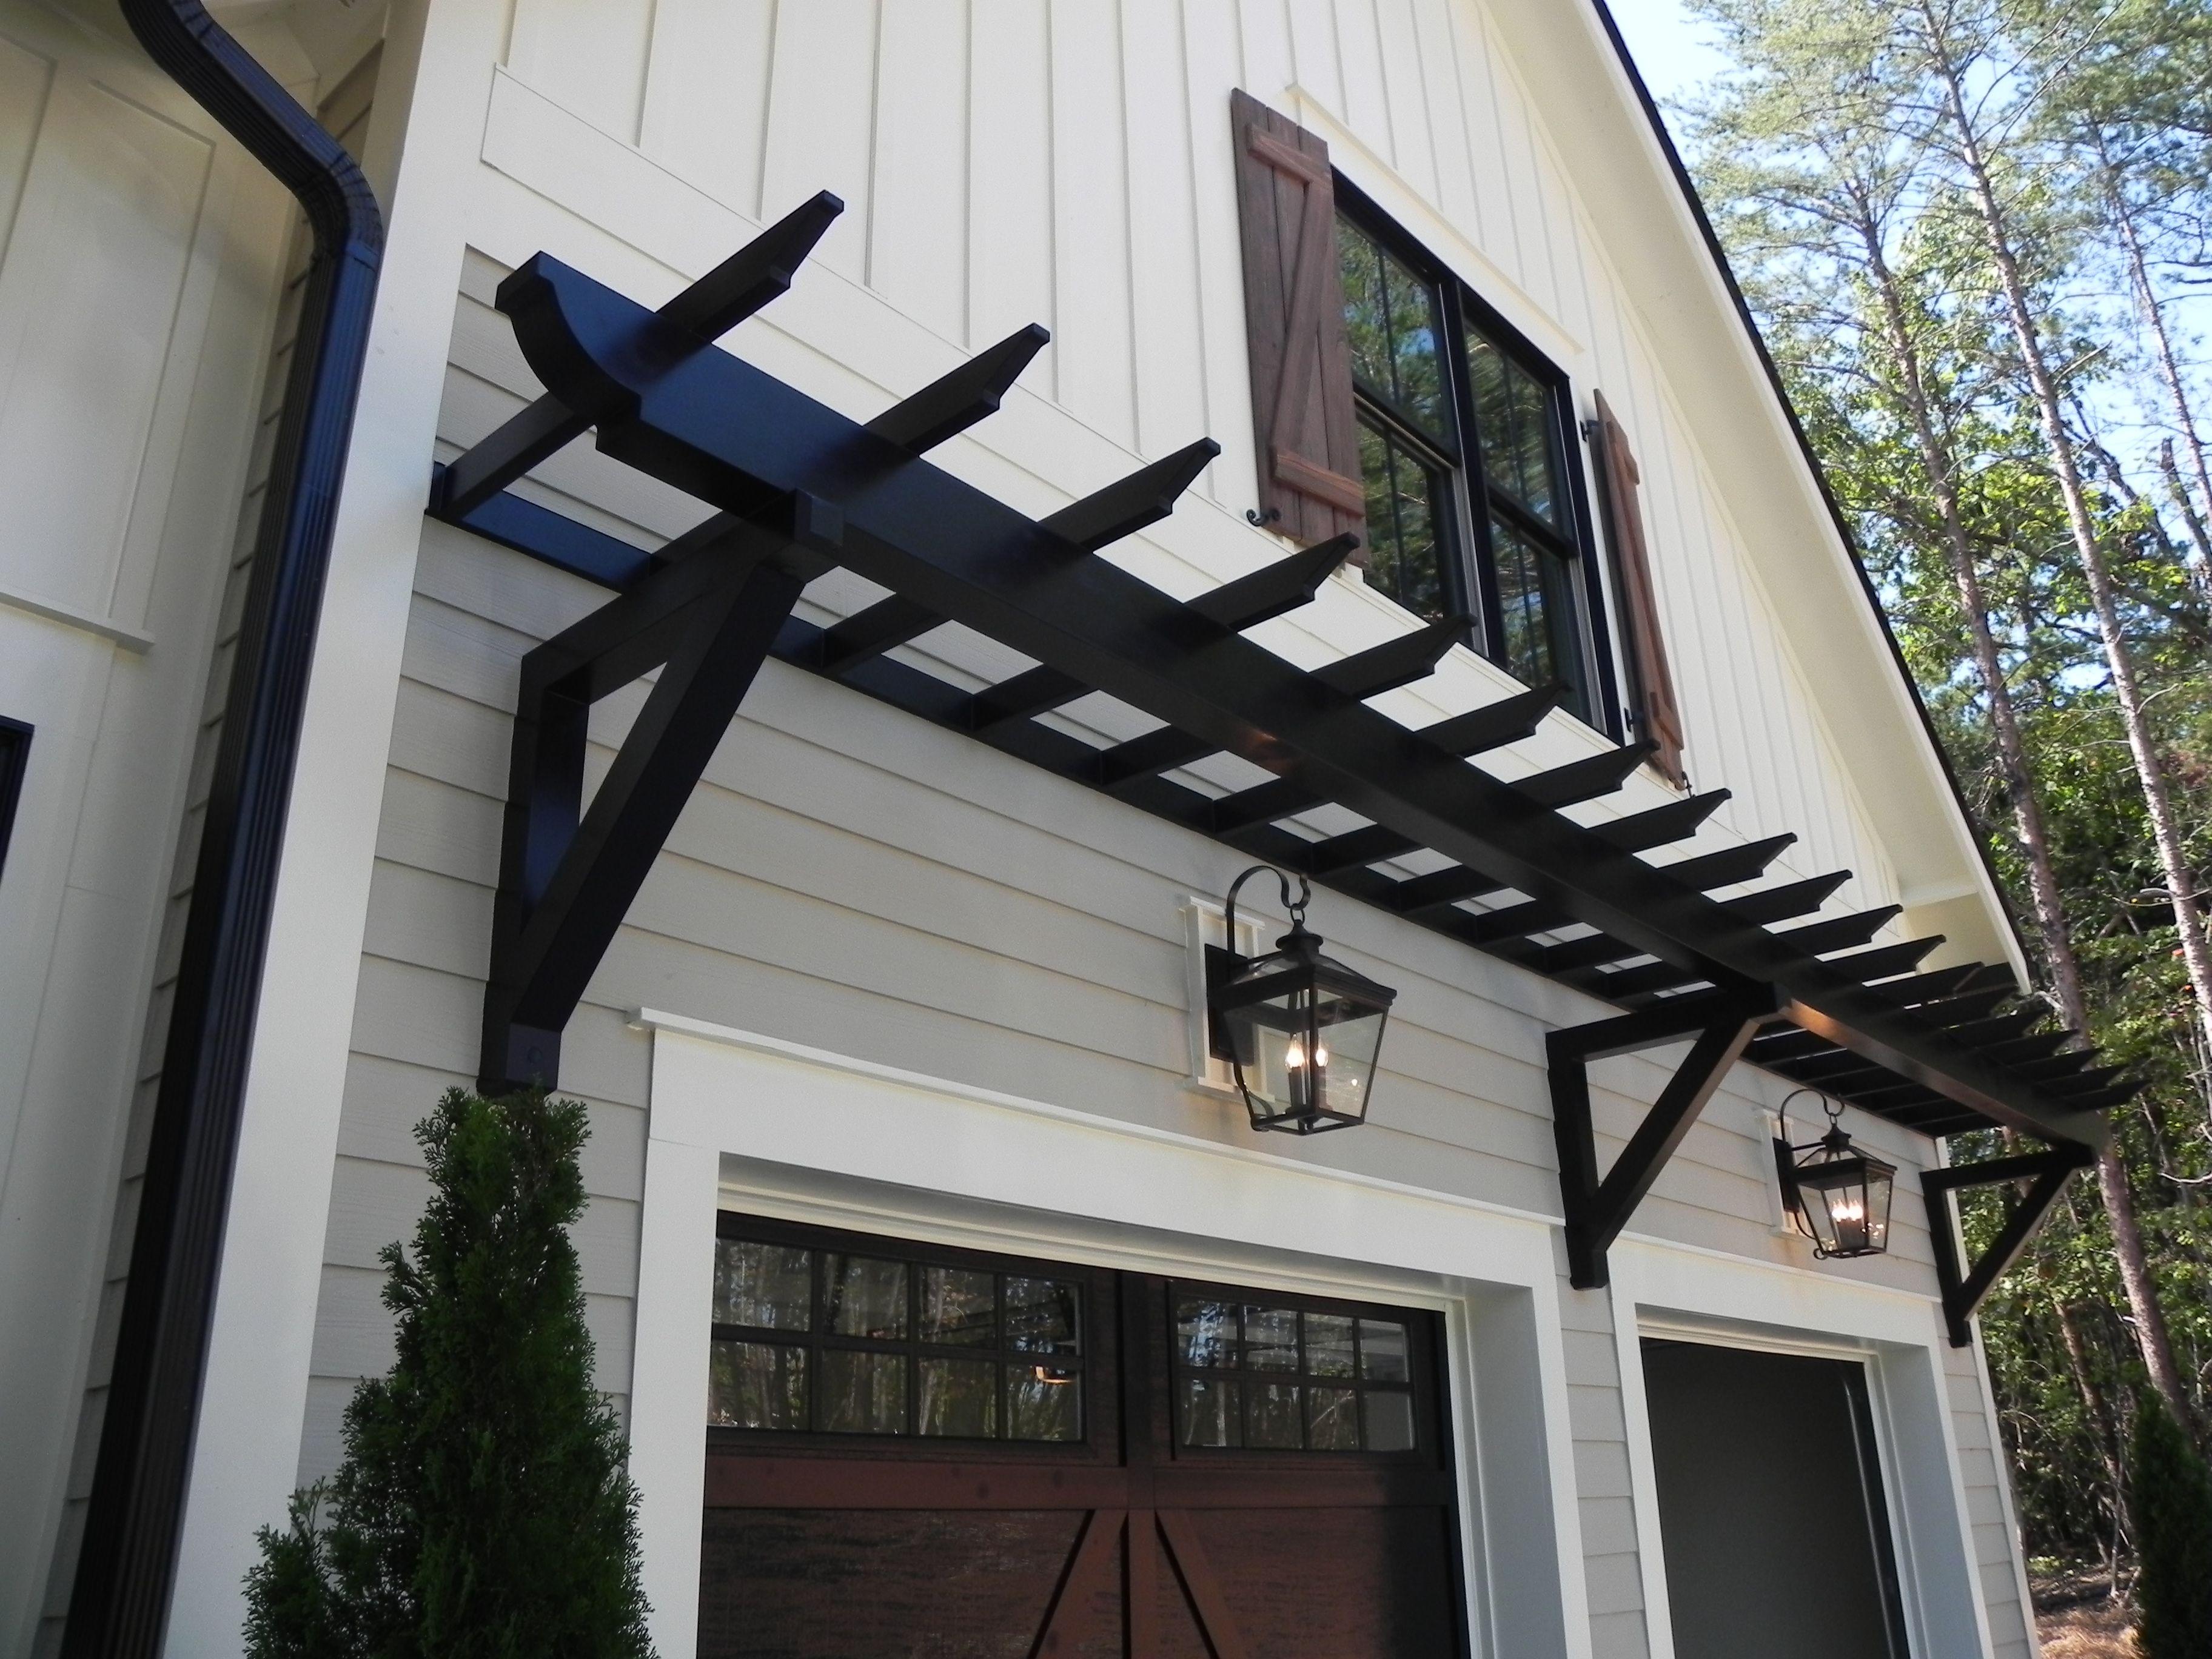 Trellis over garage door - 17 Best Images About Garage On Pinterest Craftsman Miss A And Workbench Plans